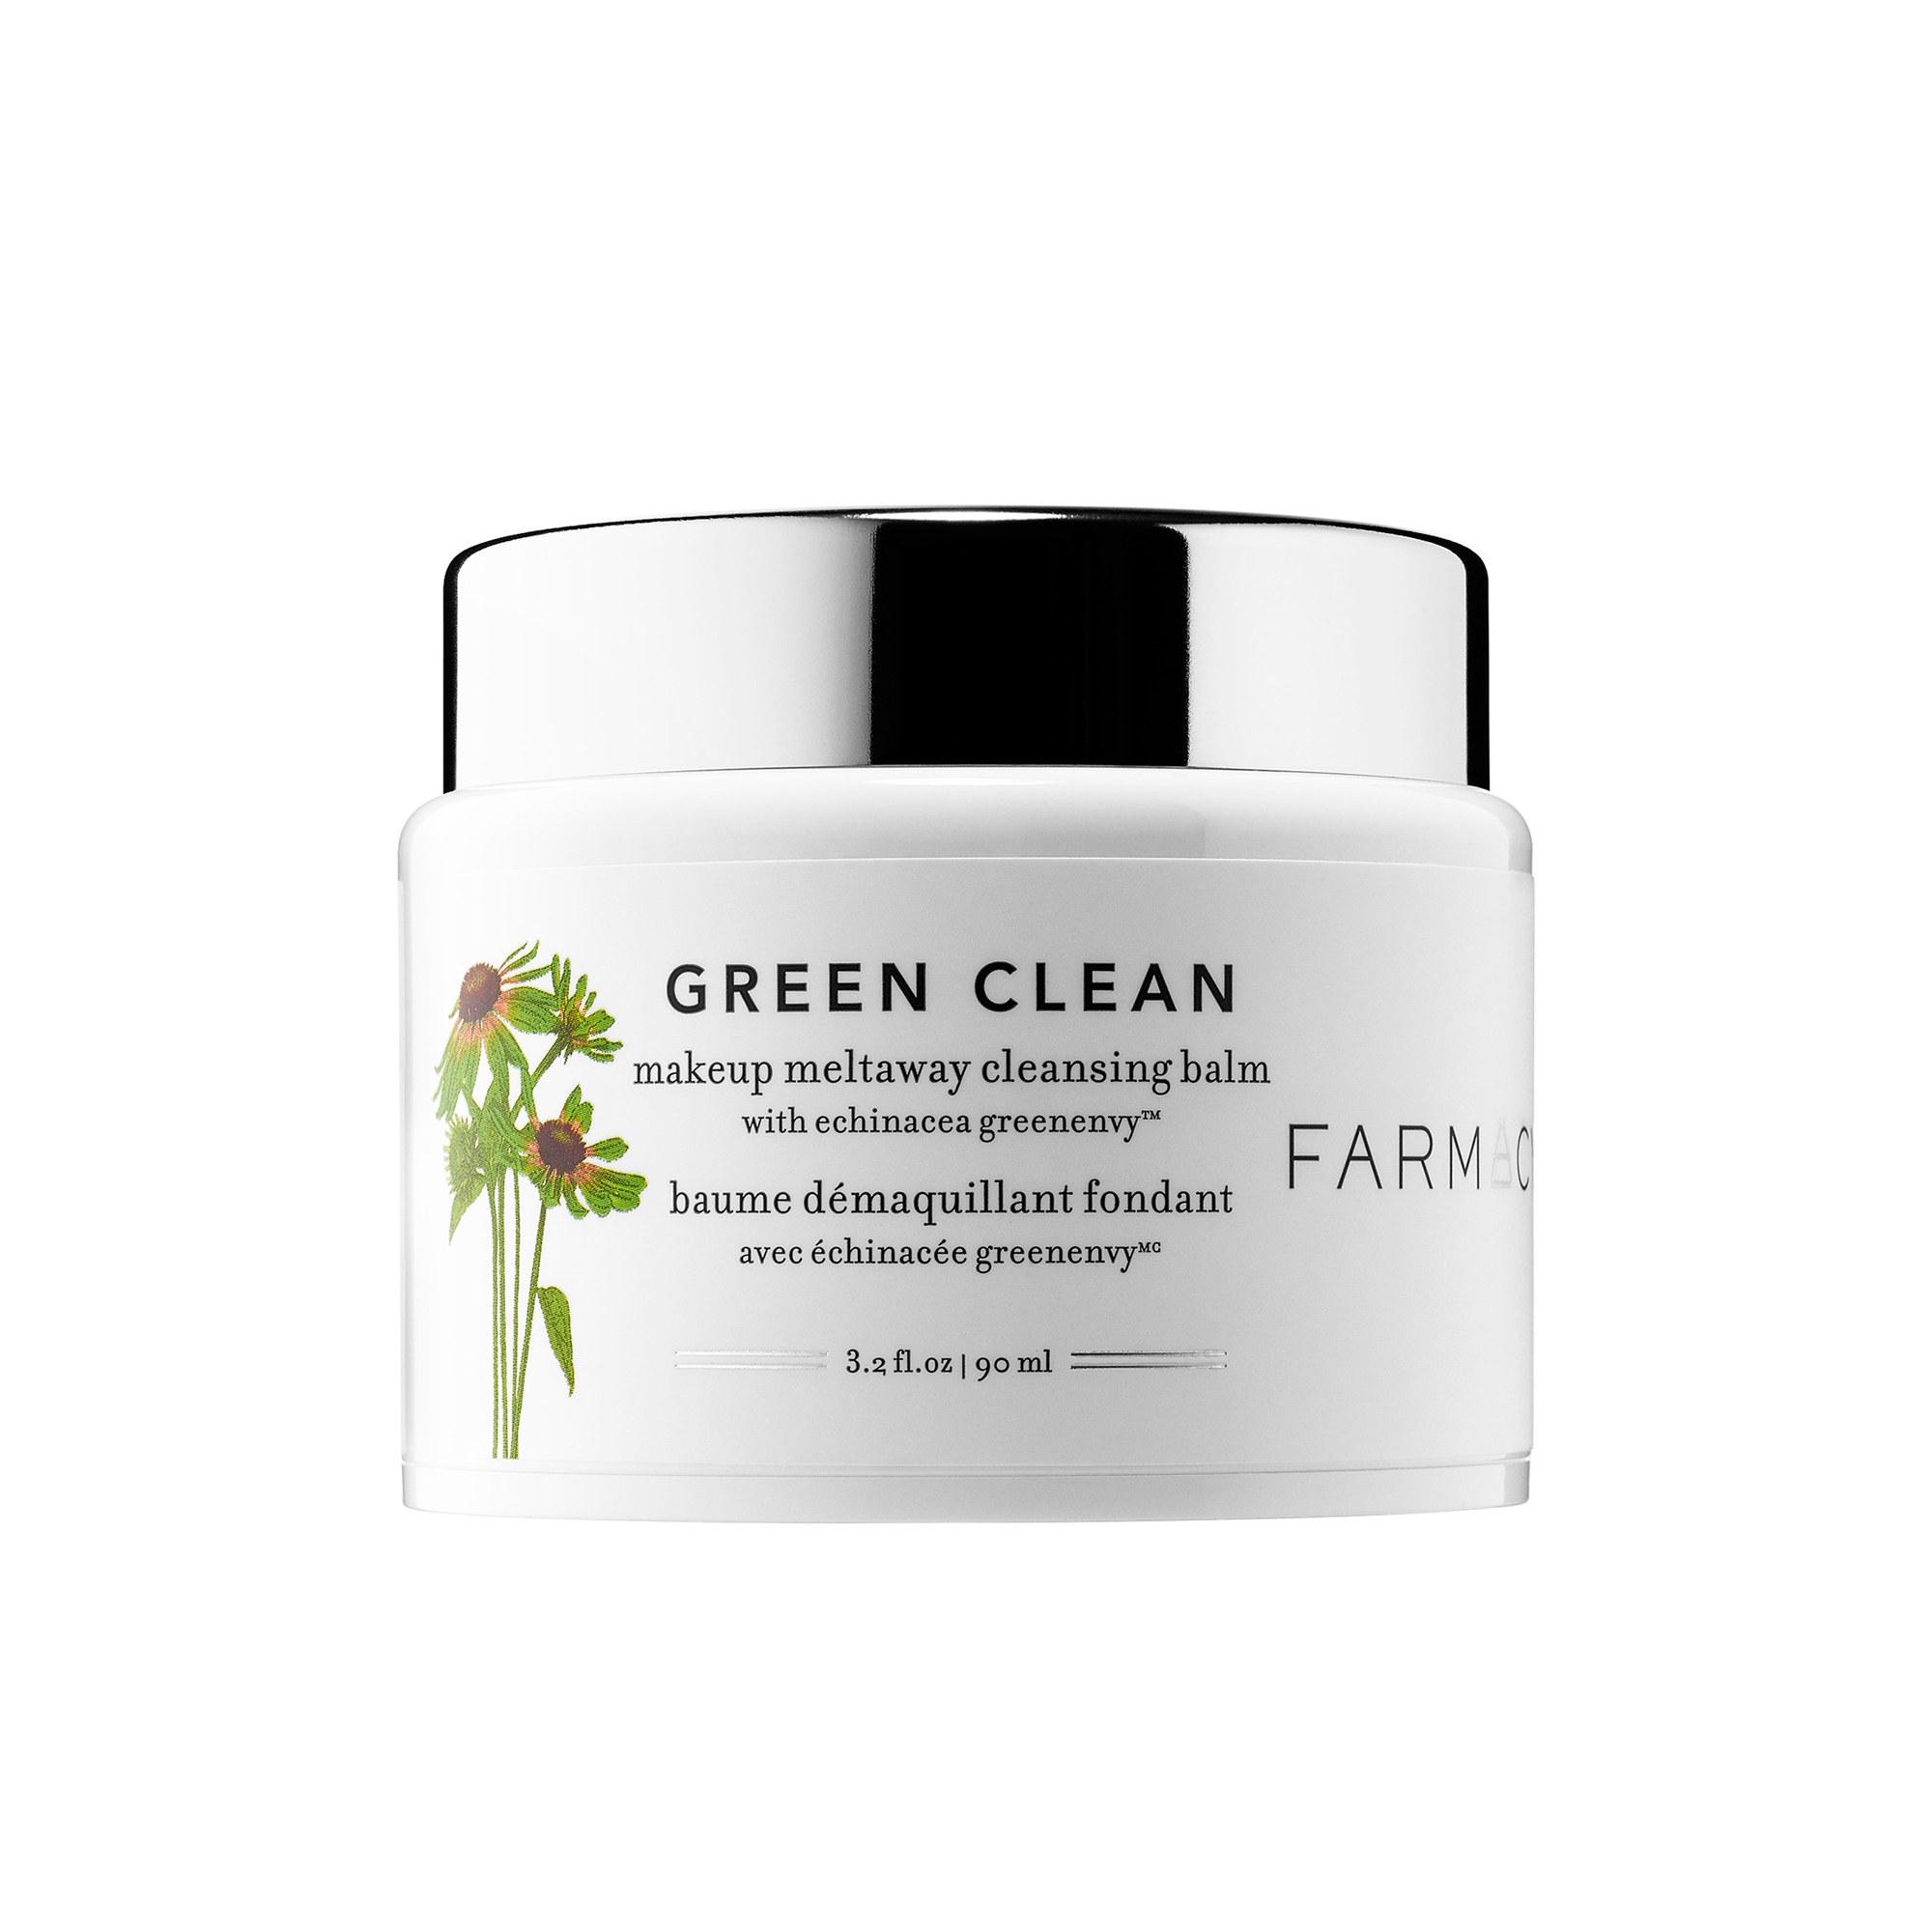 GREEN CLEAN MAKEUP MELTAWAY CLEANSING BALM -